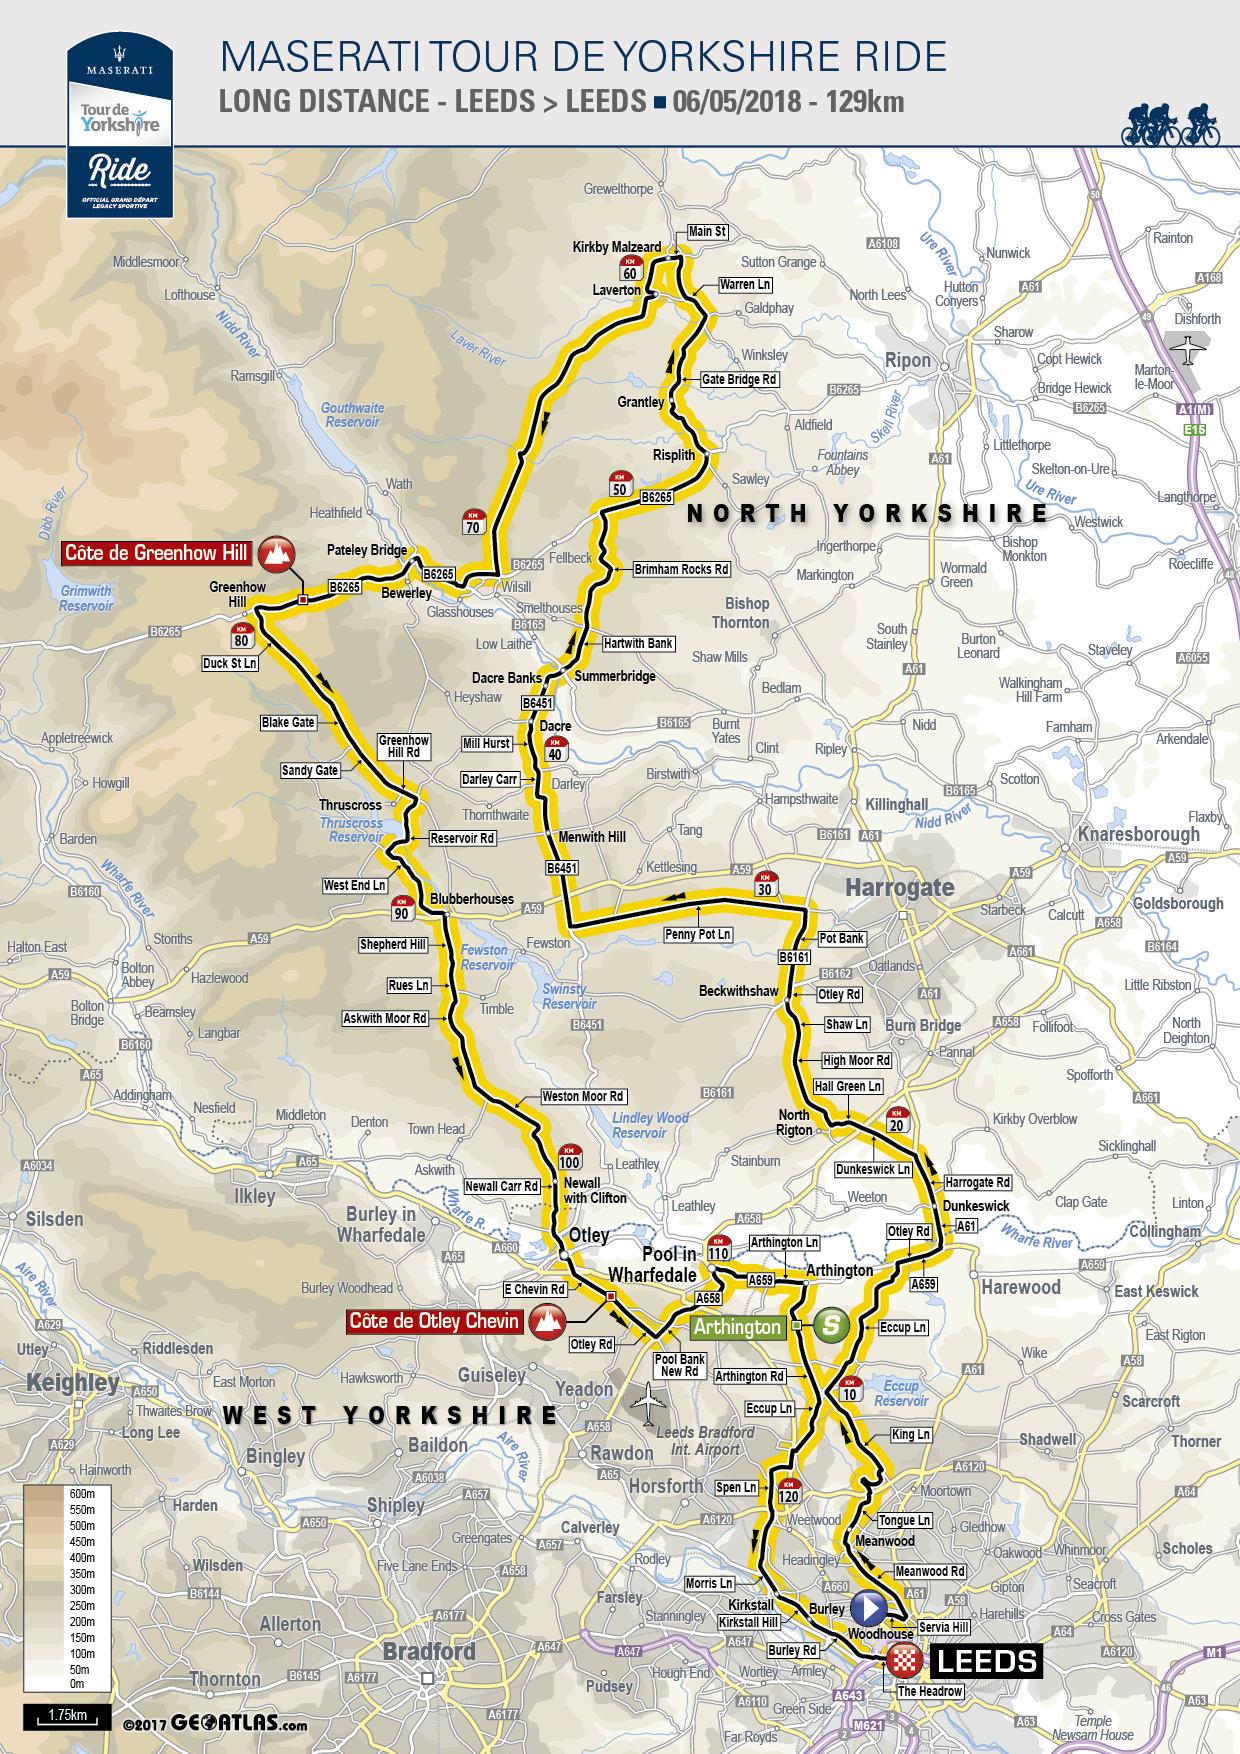 Maserati Tour de Yorkshire Ride - Route 2018